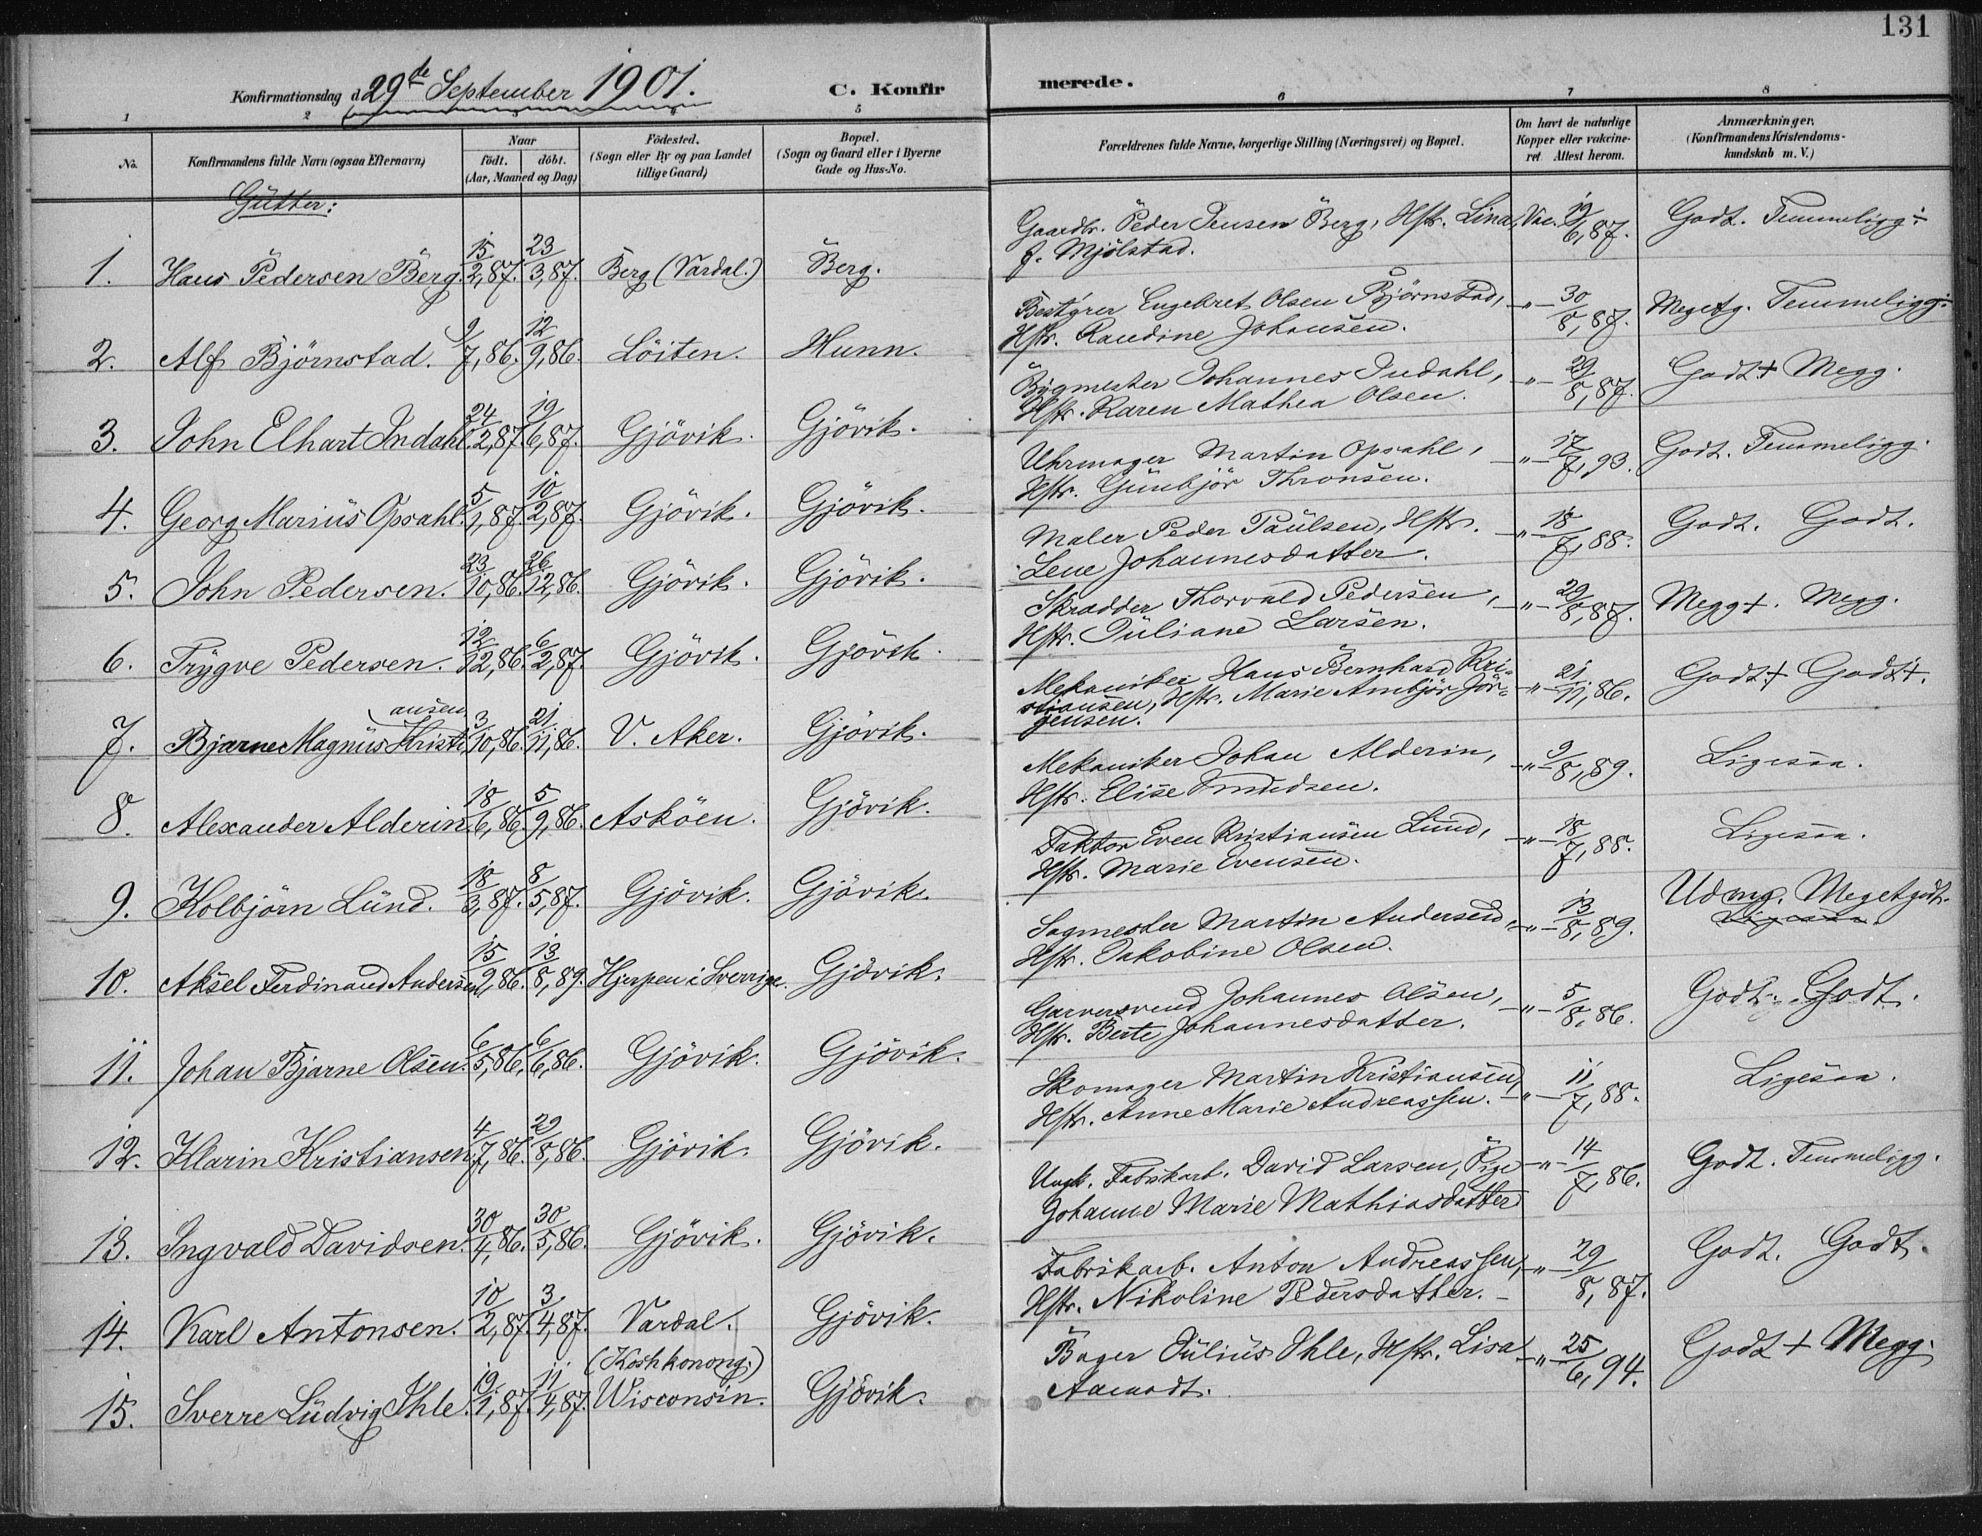 SAH, Vardal prestekontor, H/Ha/Haa/L0013: Ministerialbok nr. 13, 1901-1911, s. 131